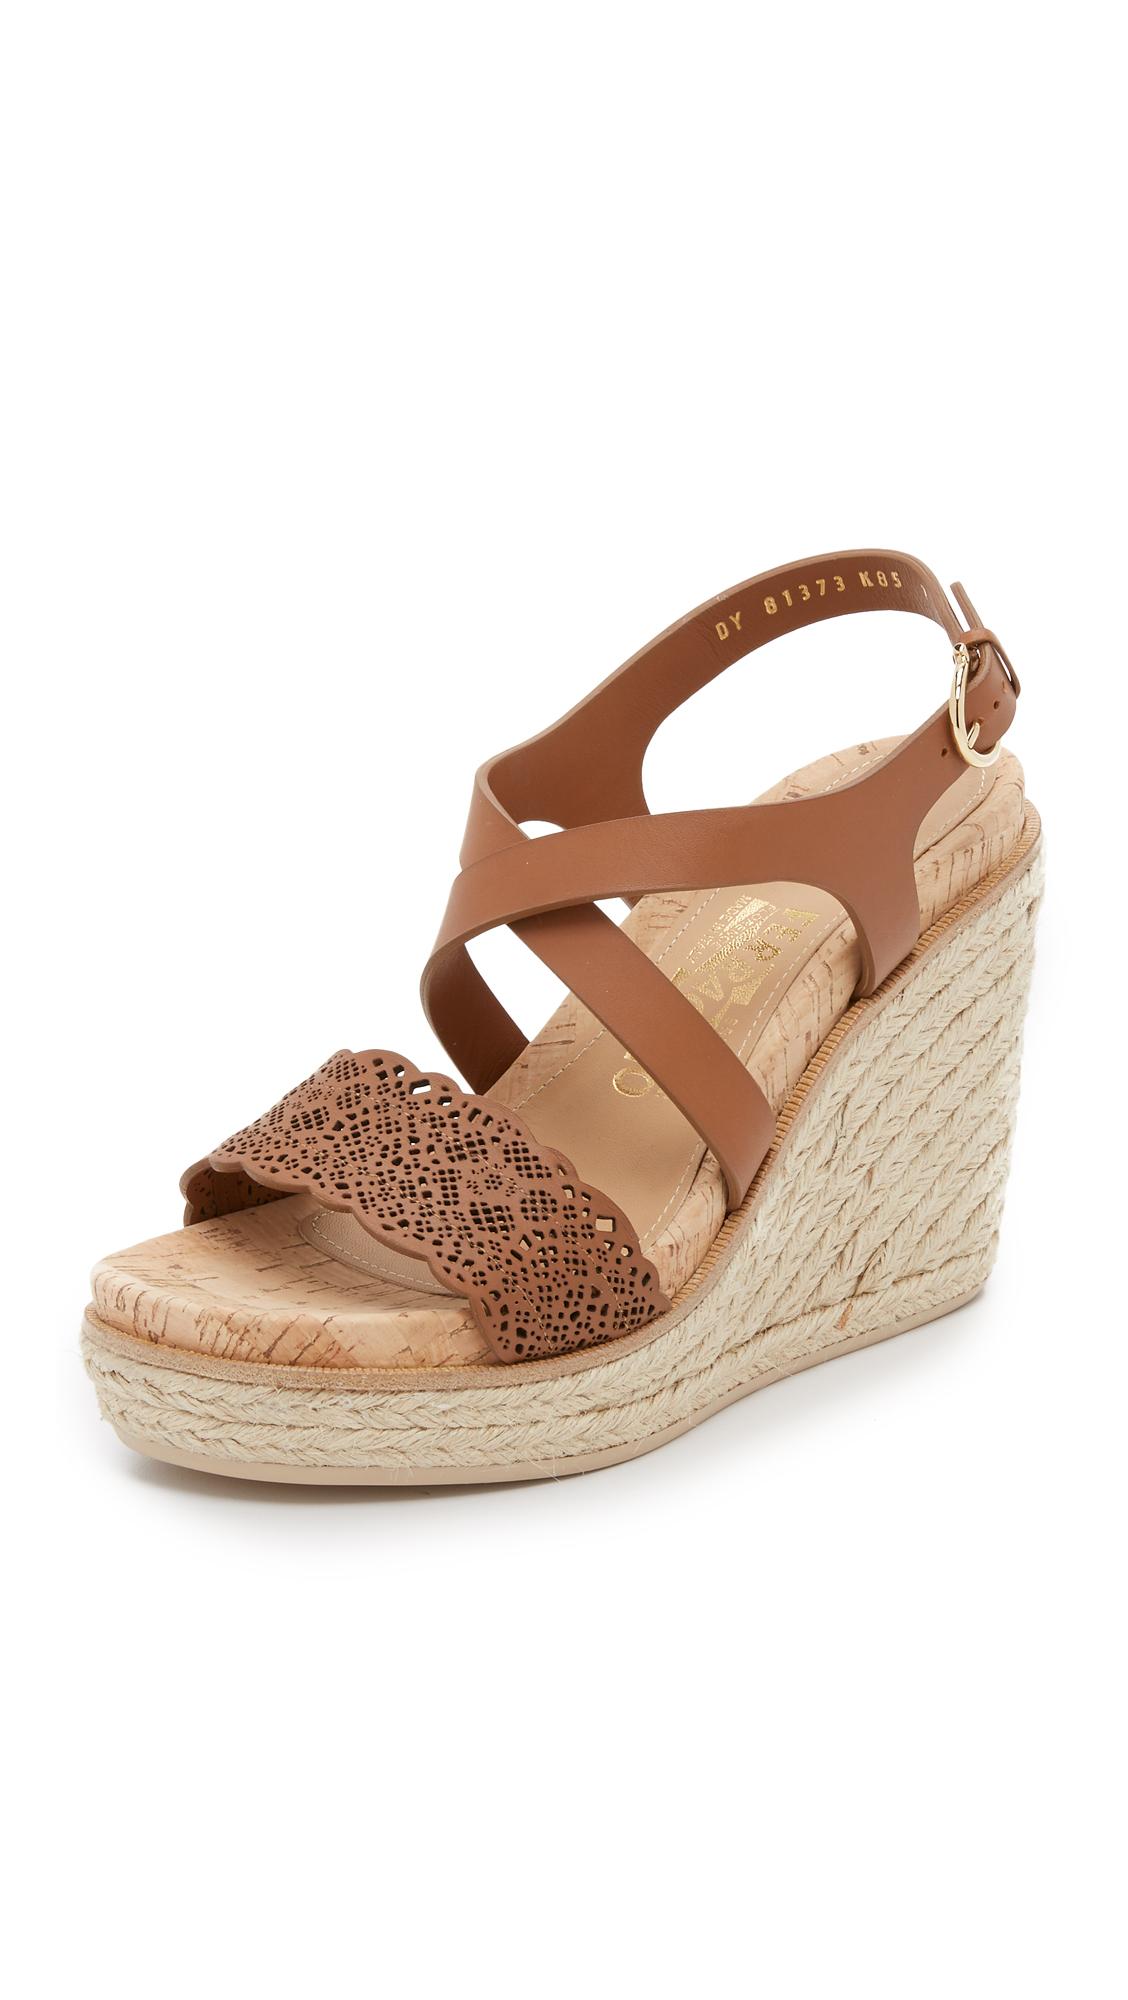 Ferragamo Gioela Wedge Sandals In Natural Lyst